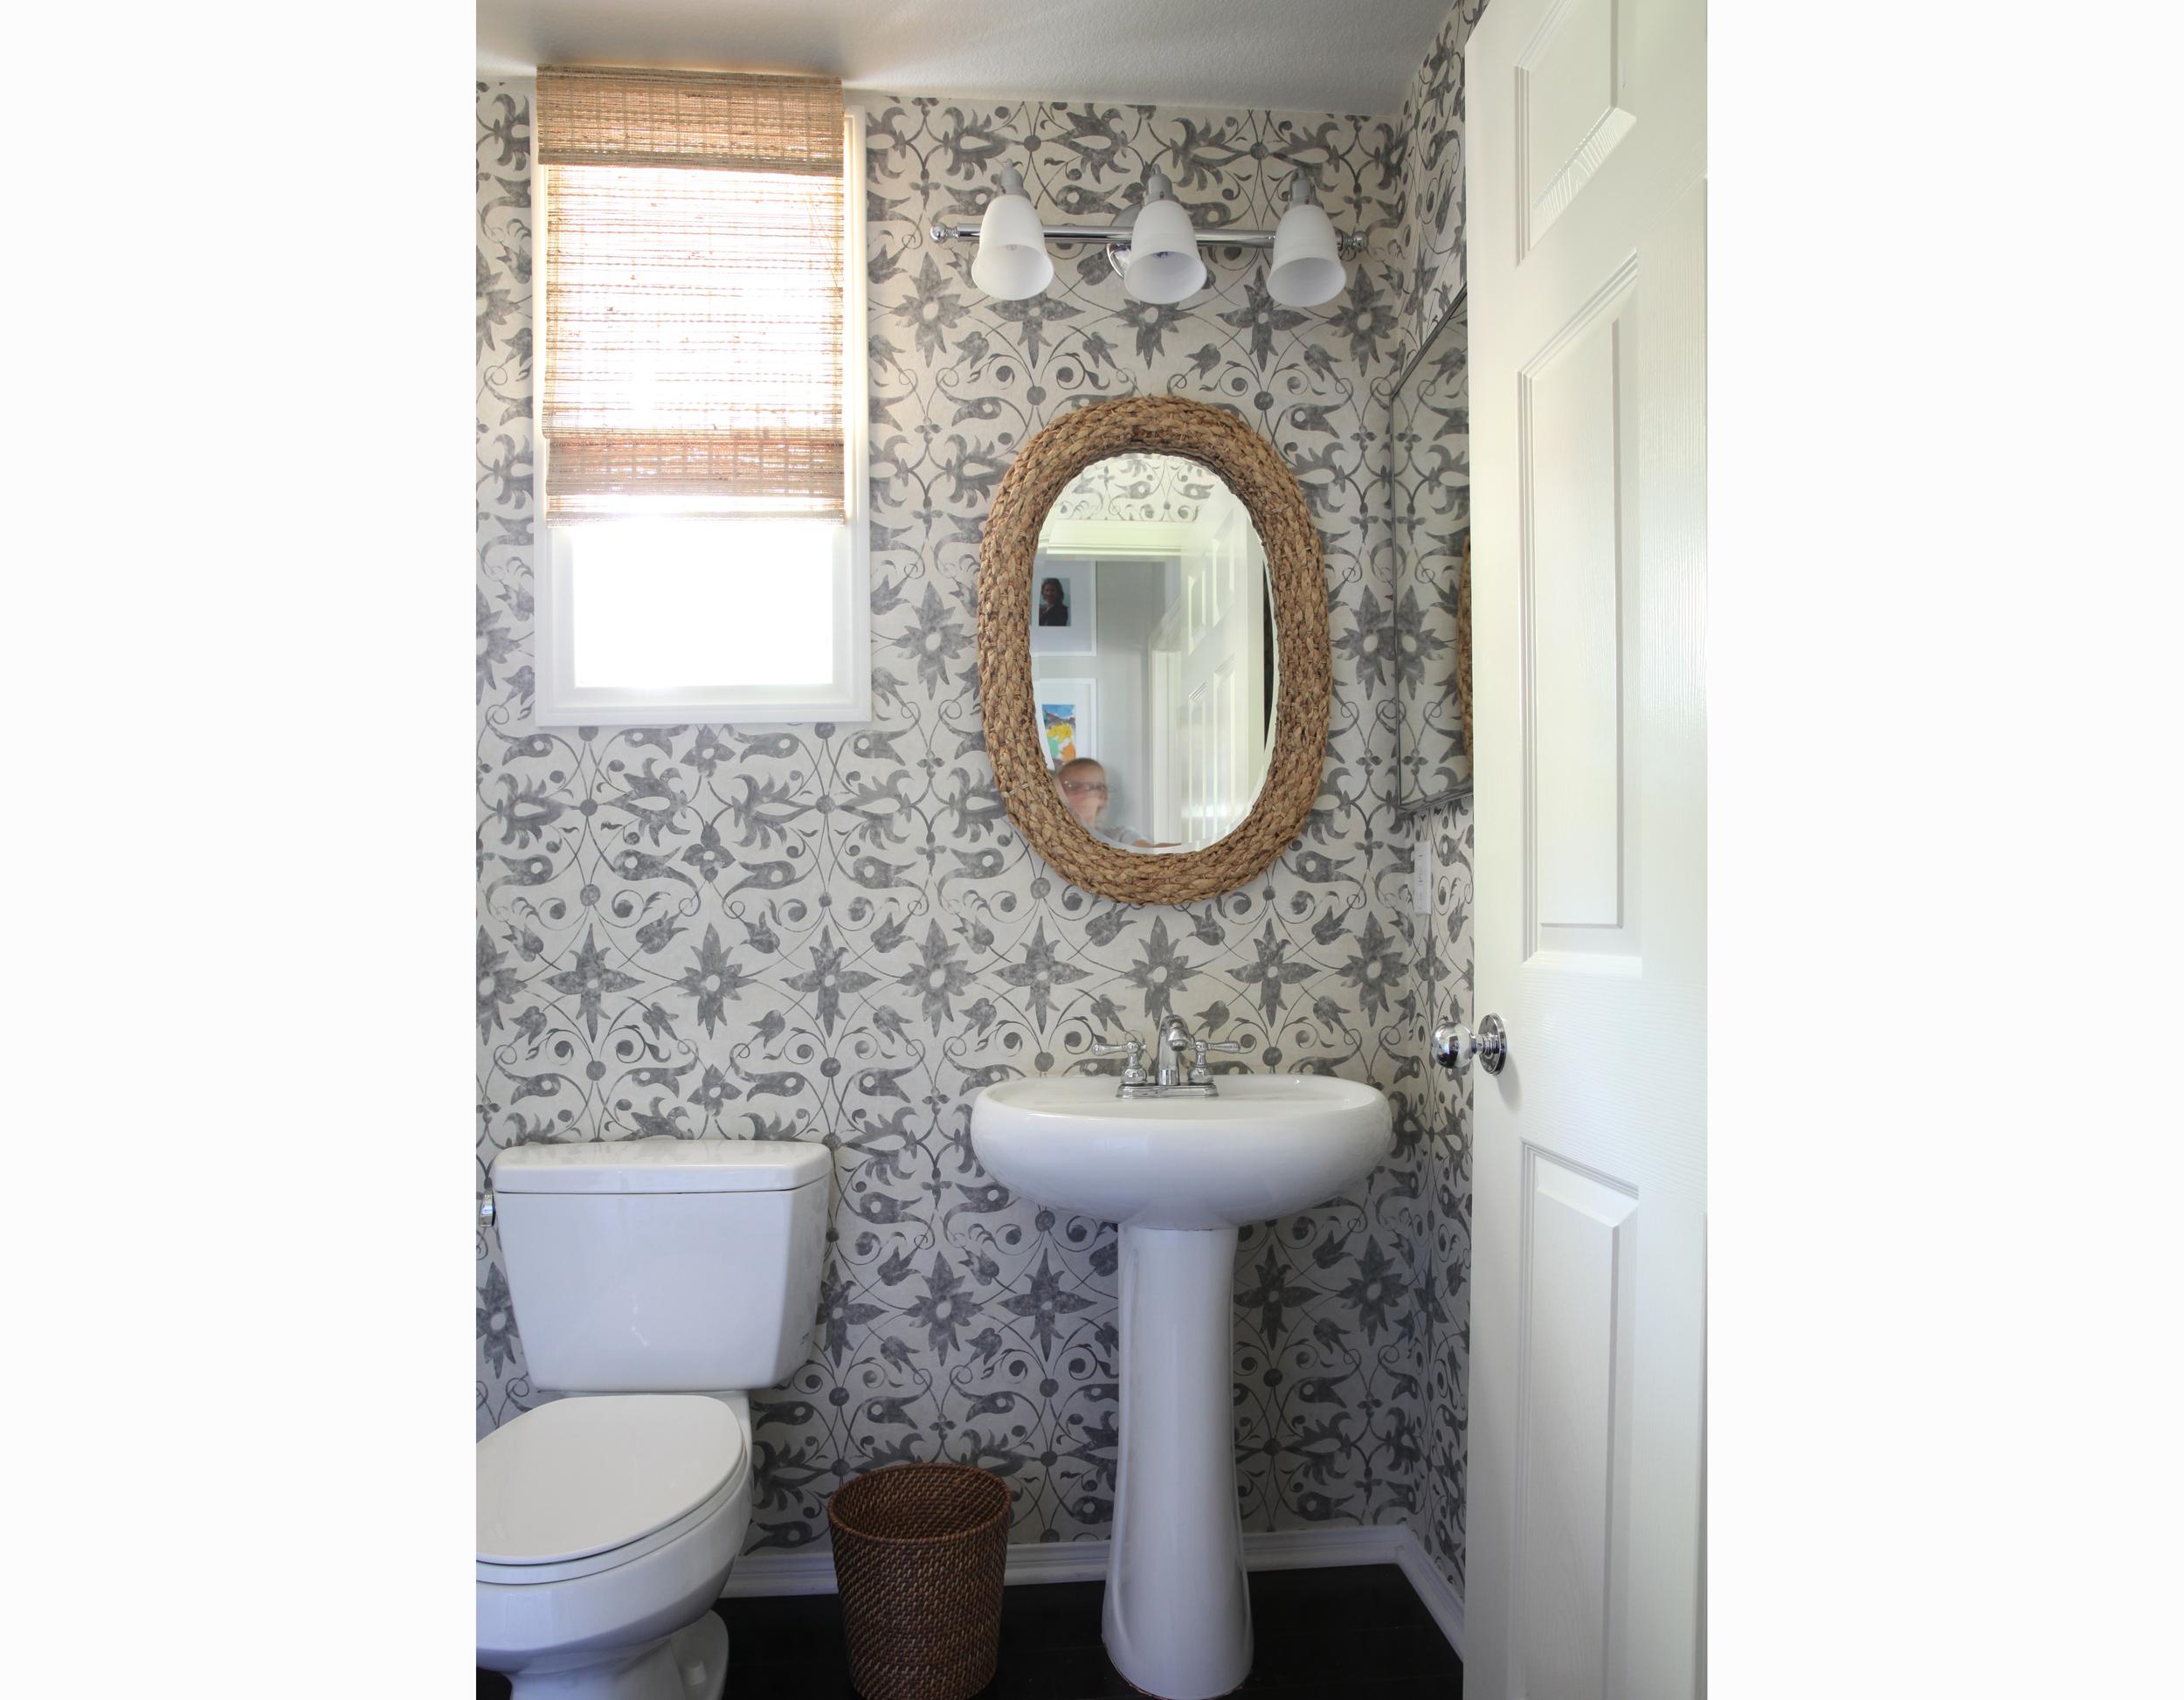 irvine interior designer brittany stiles orange county powder room wallpaper.jpg